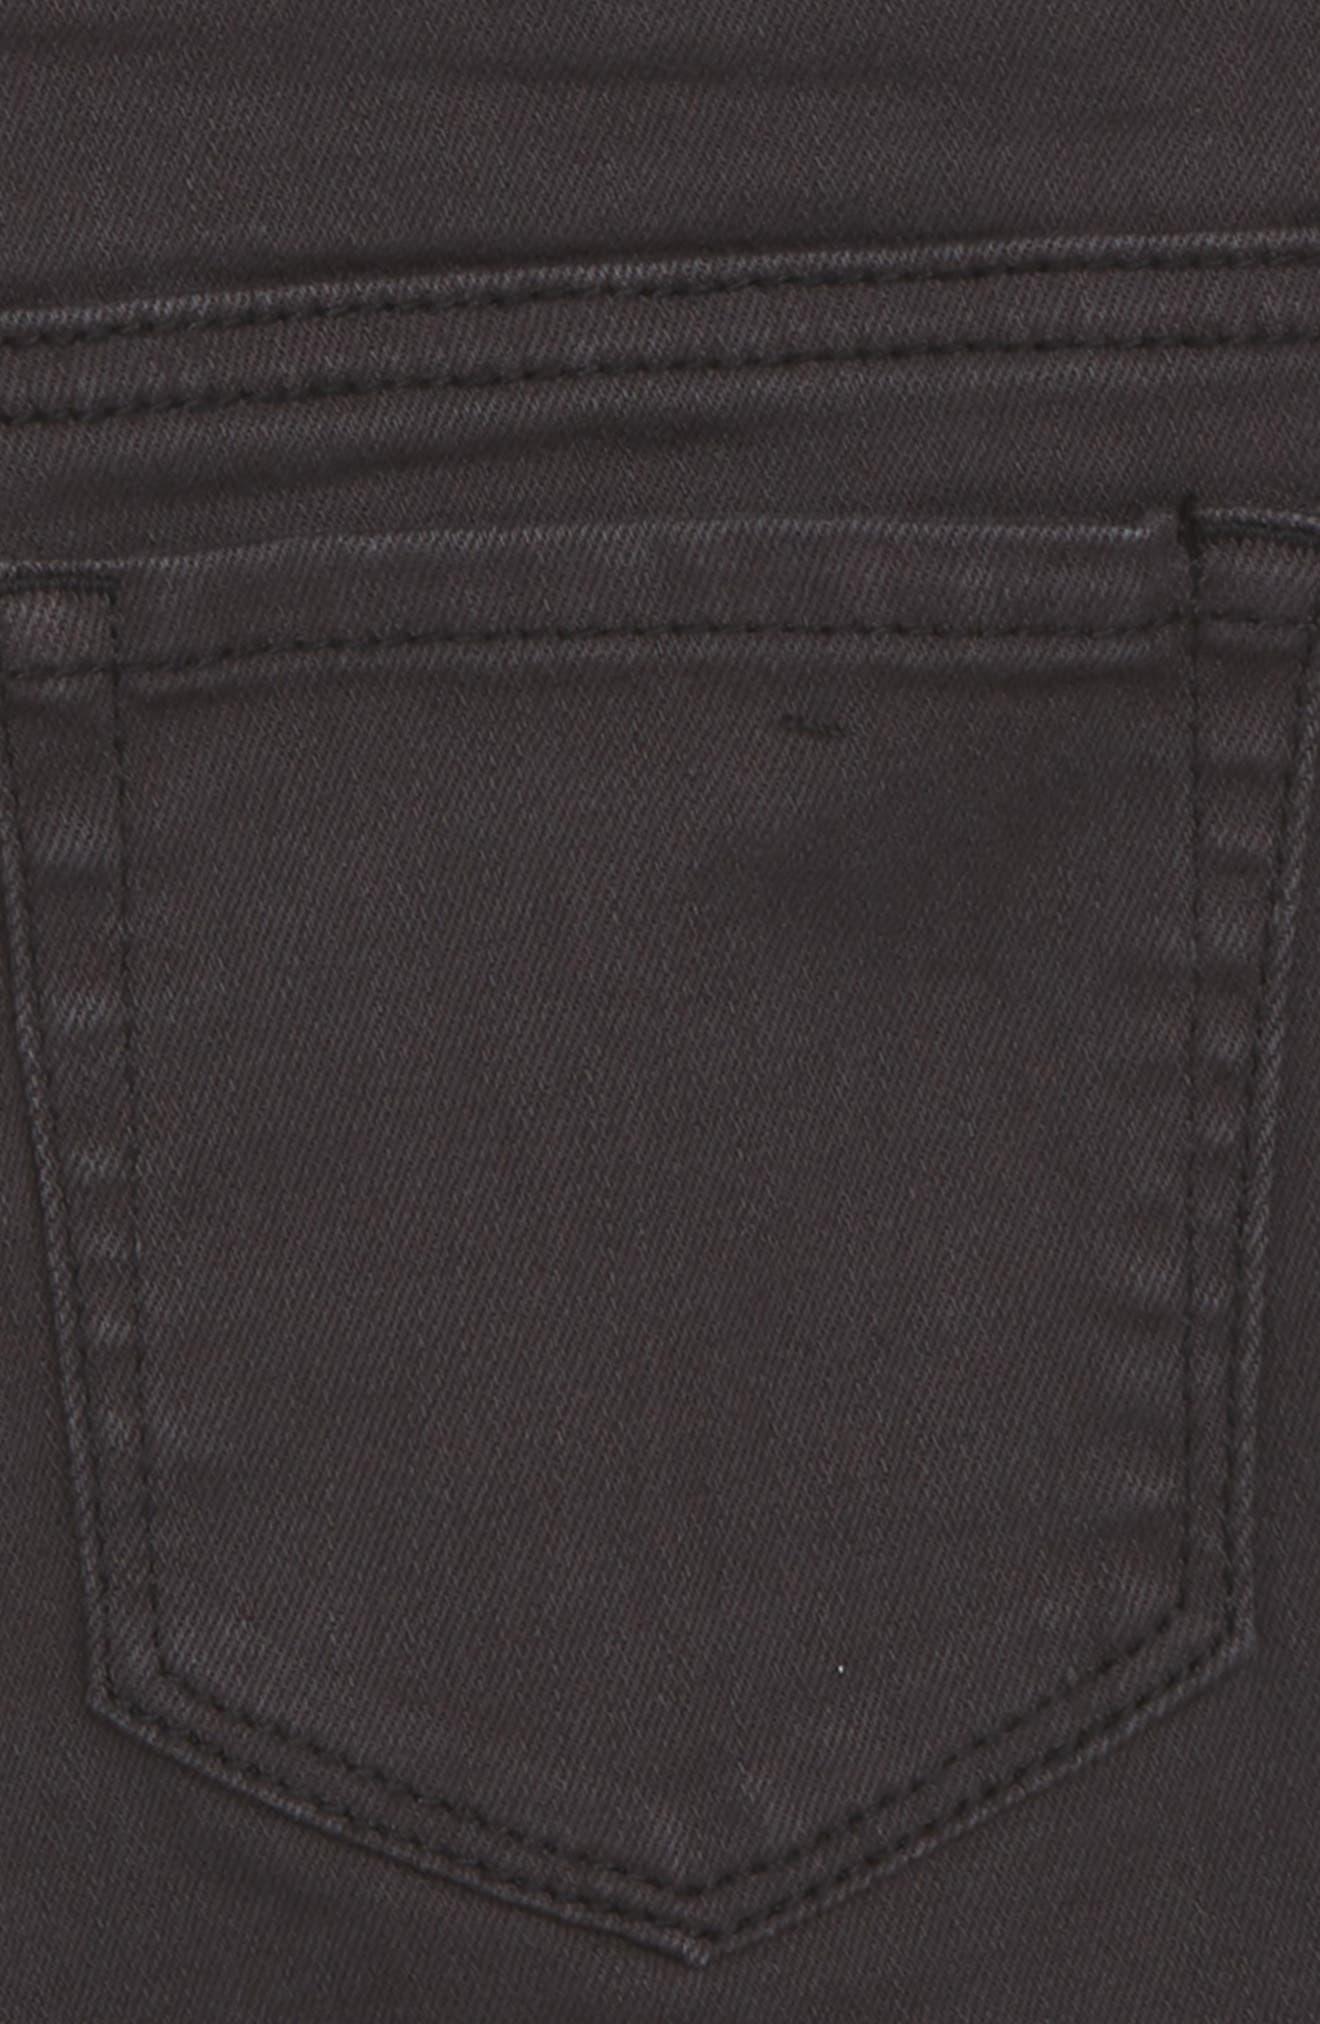 Distressed Cutoff Denim Shorts,                             Alternate thumbnail 3, color,                             BLACK